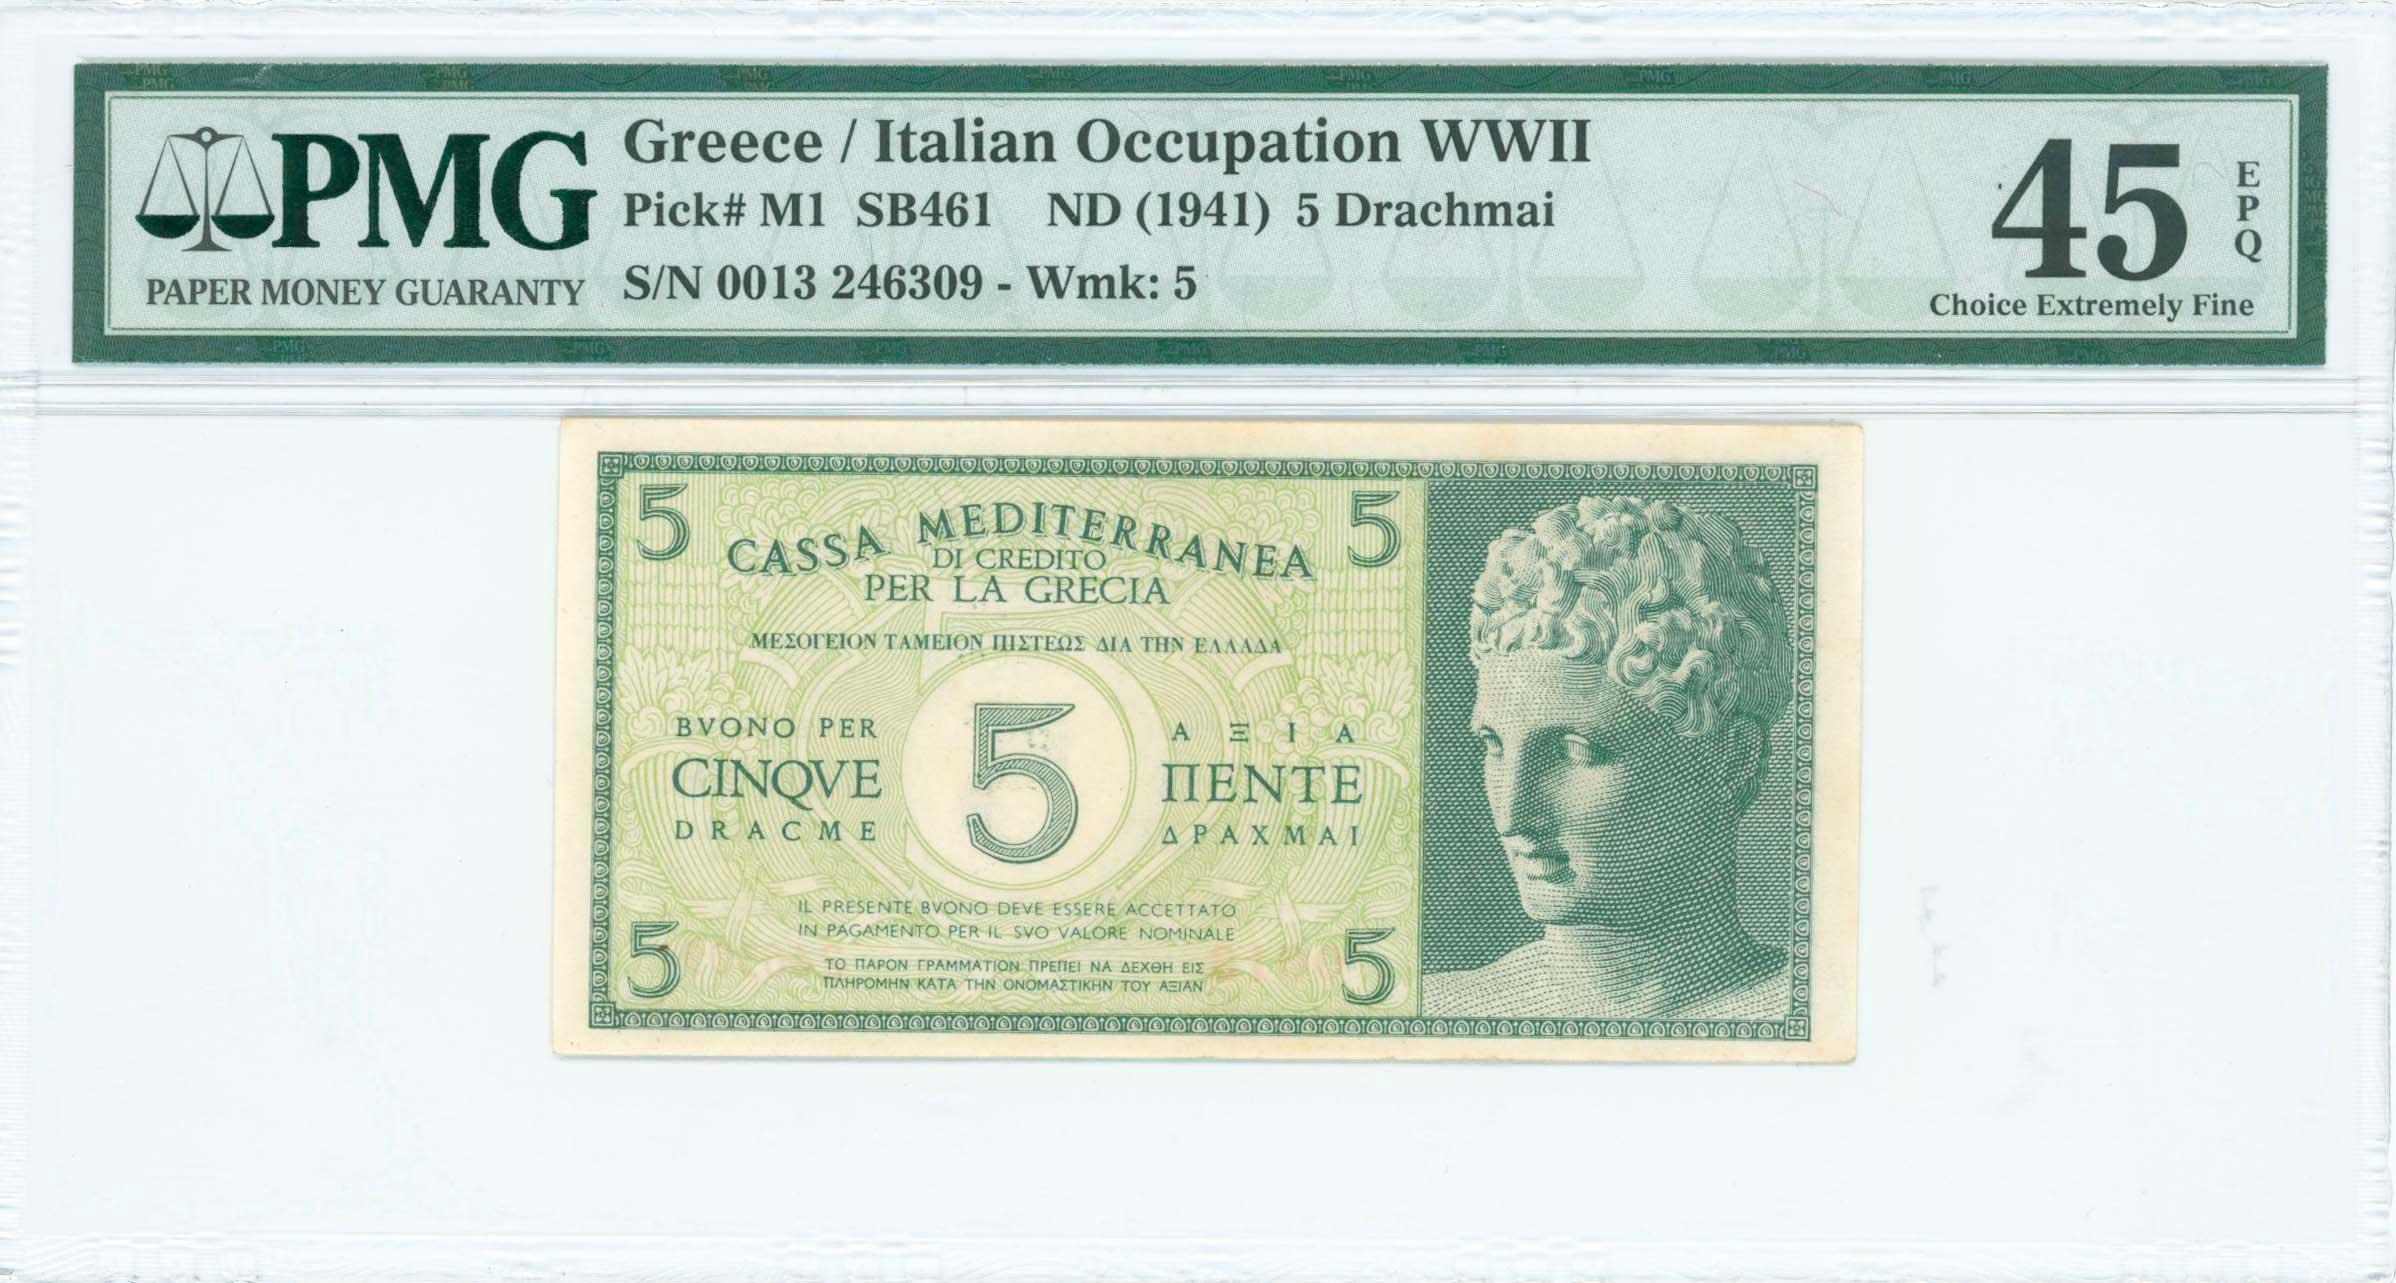 Lot 6700 - -  PAPER MONEY - BANKNOTES italian occupation -  A. Karamitsos Postal & Live Internet Auction 984  (Part A)